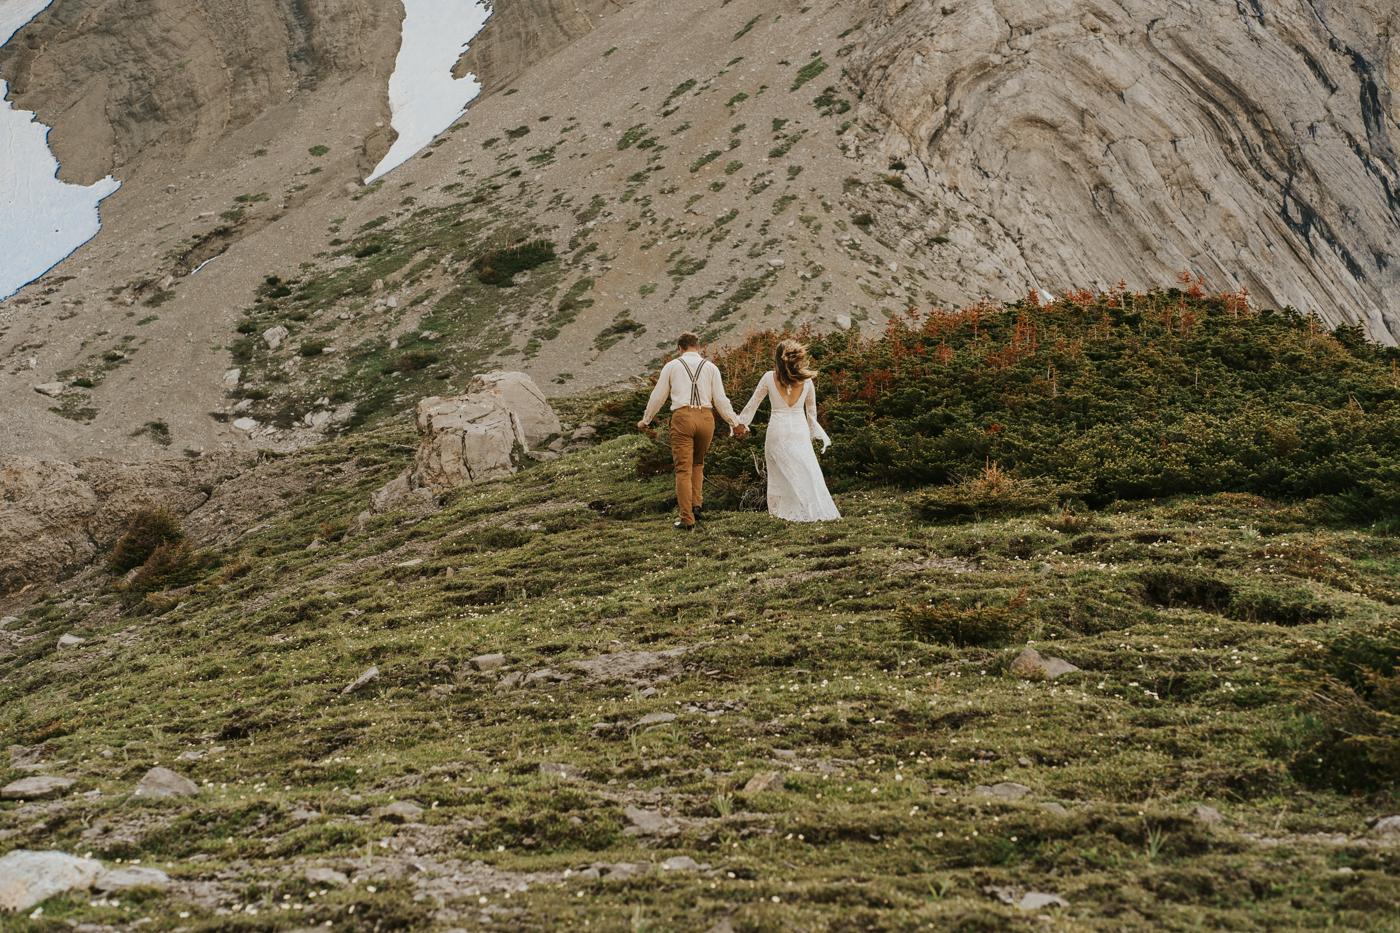 tyraephotography_photographer_wedding_elopement_engagement_photography-00343.jpg